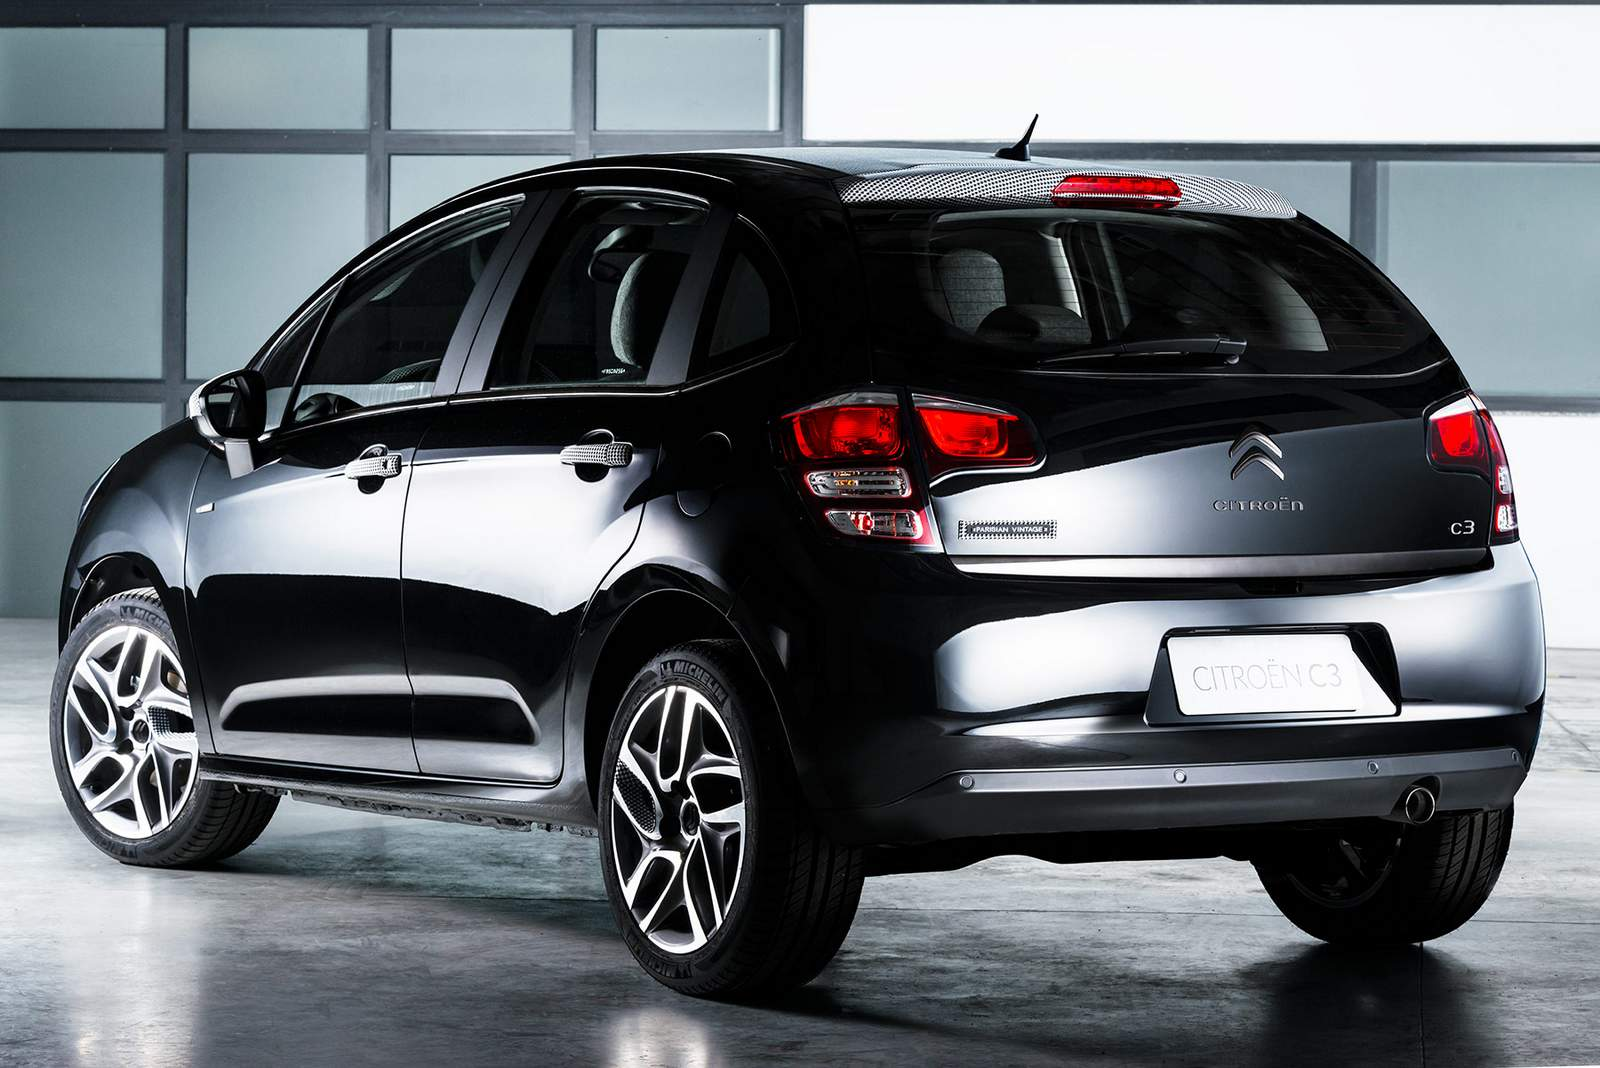 [SALON] Salon Automobile de Sao Paulo 2014 Citroen%2BC3%2BParis%2BVintage%2B%281%29